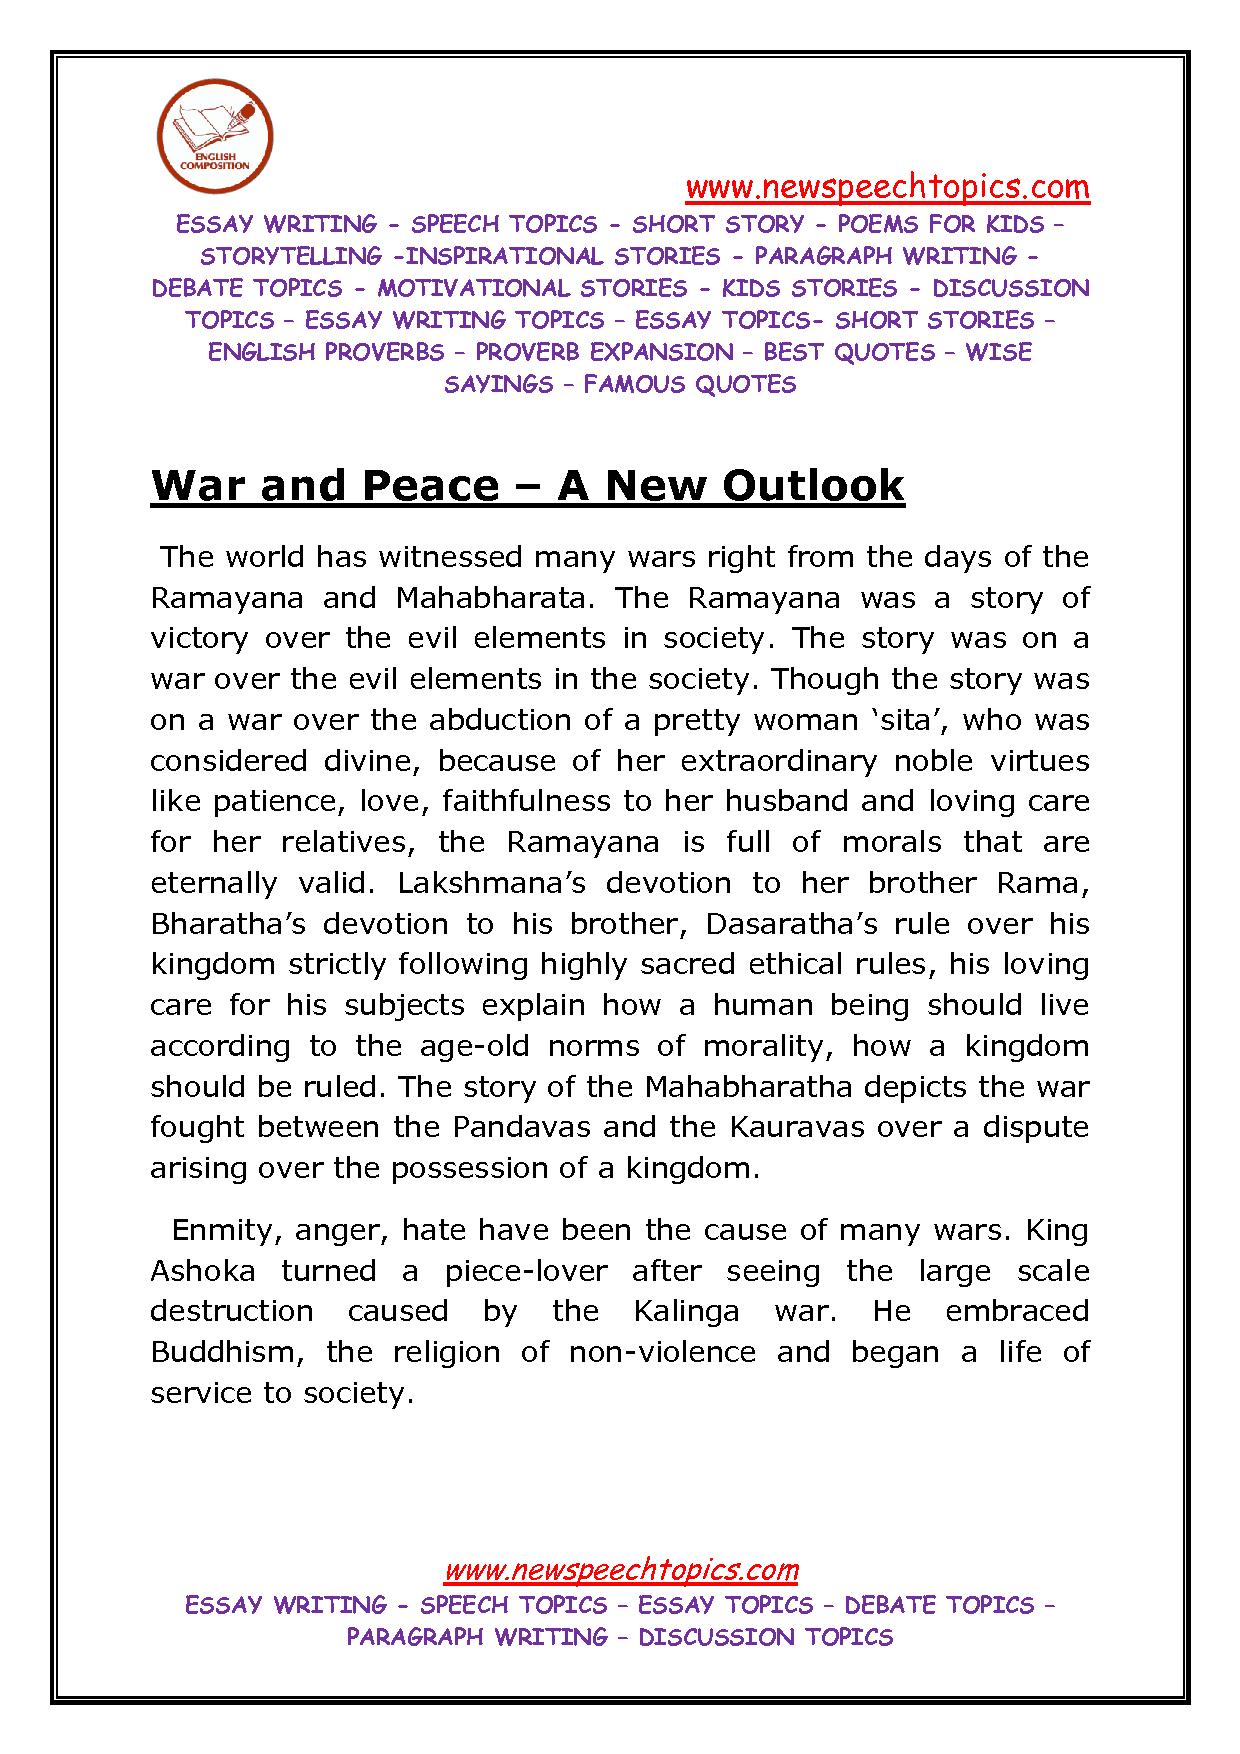 Essay of peaceful world